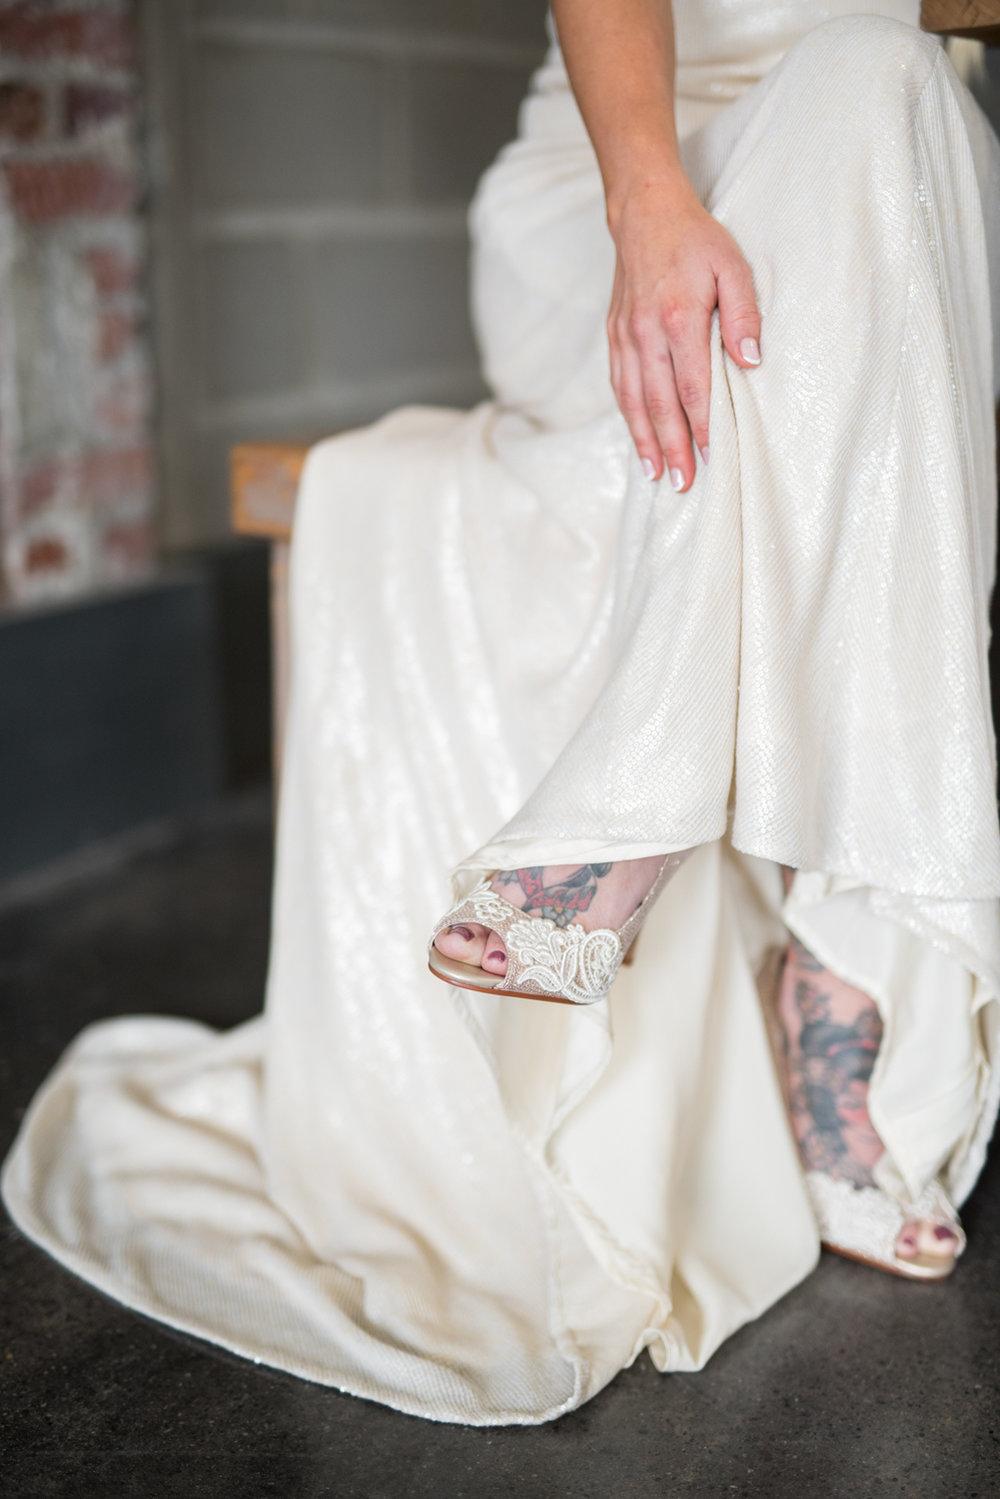 Mink Maids Wedding Dress- New Jersey Weddings- Olivia Christina Photography